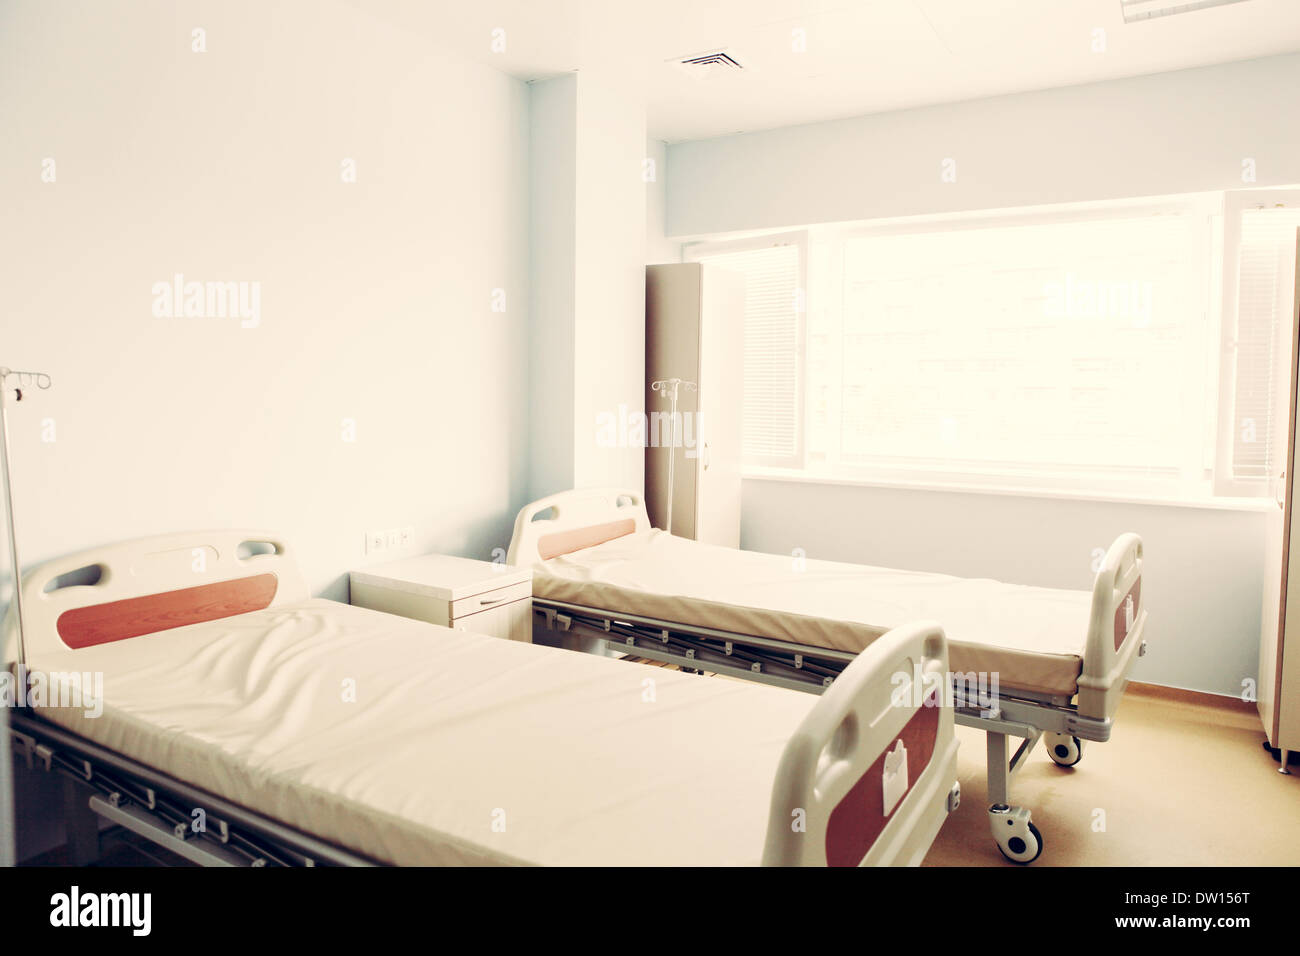 Hospital Interior Stock Photo: 67023568 - Alamy